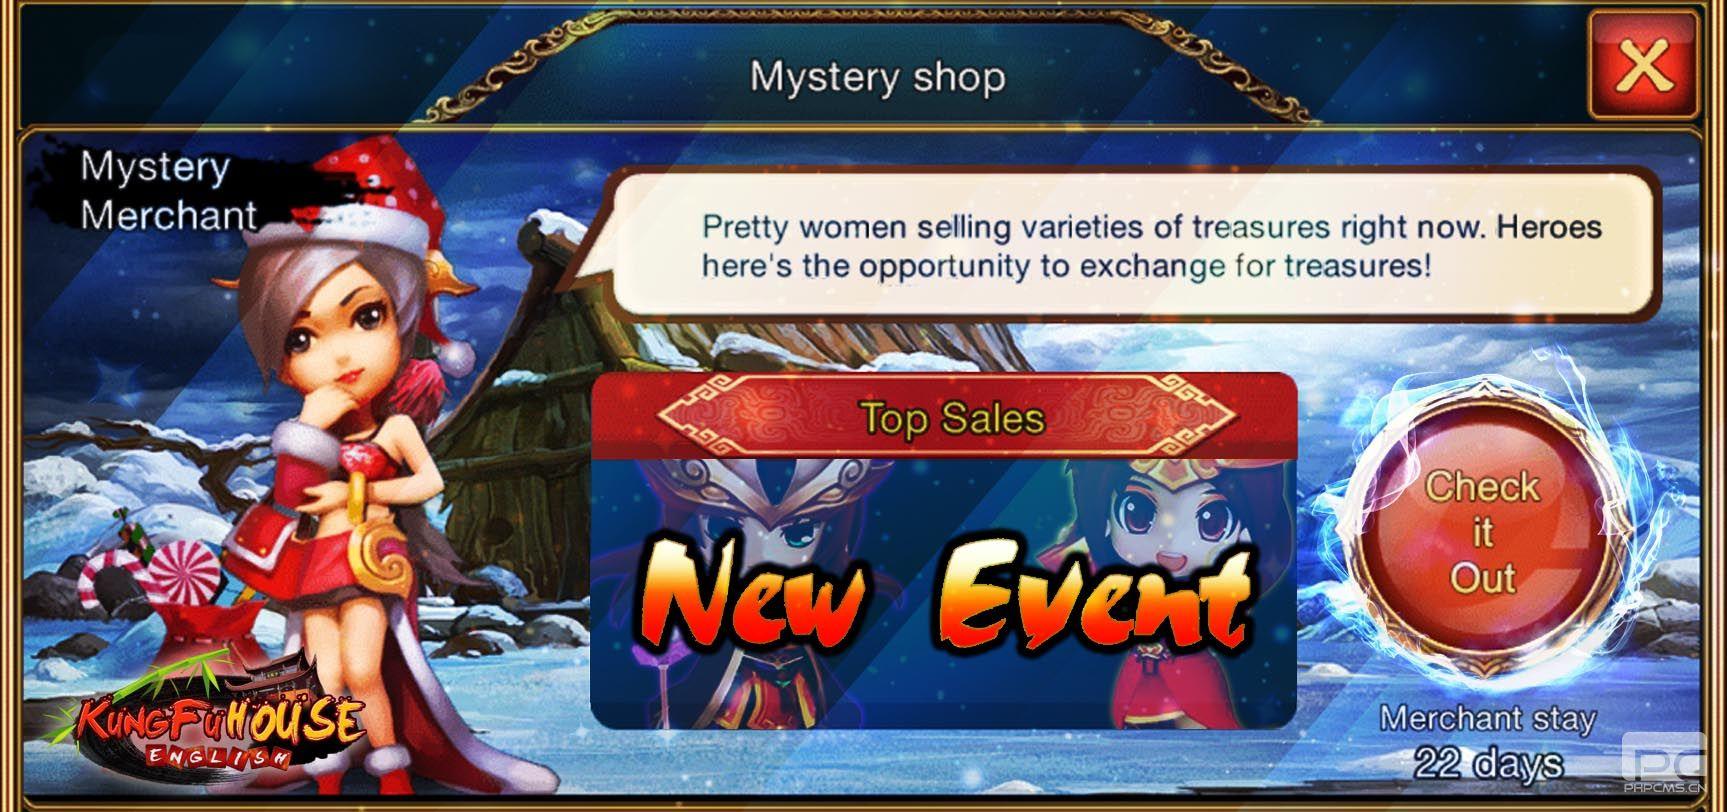 Mystery Merchant is back on Valentine's Week!